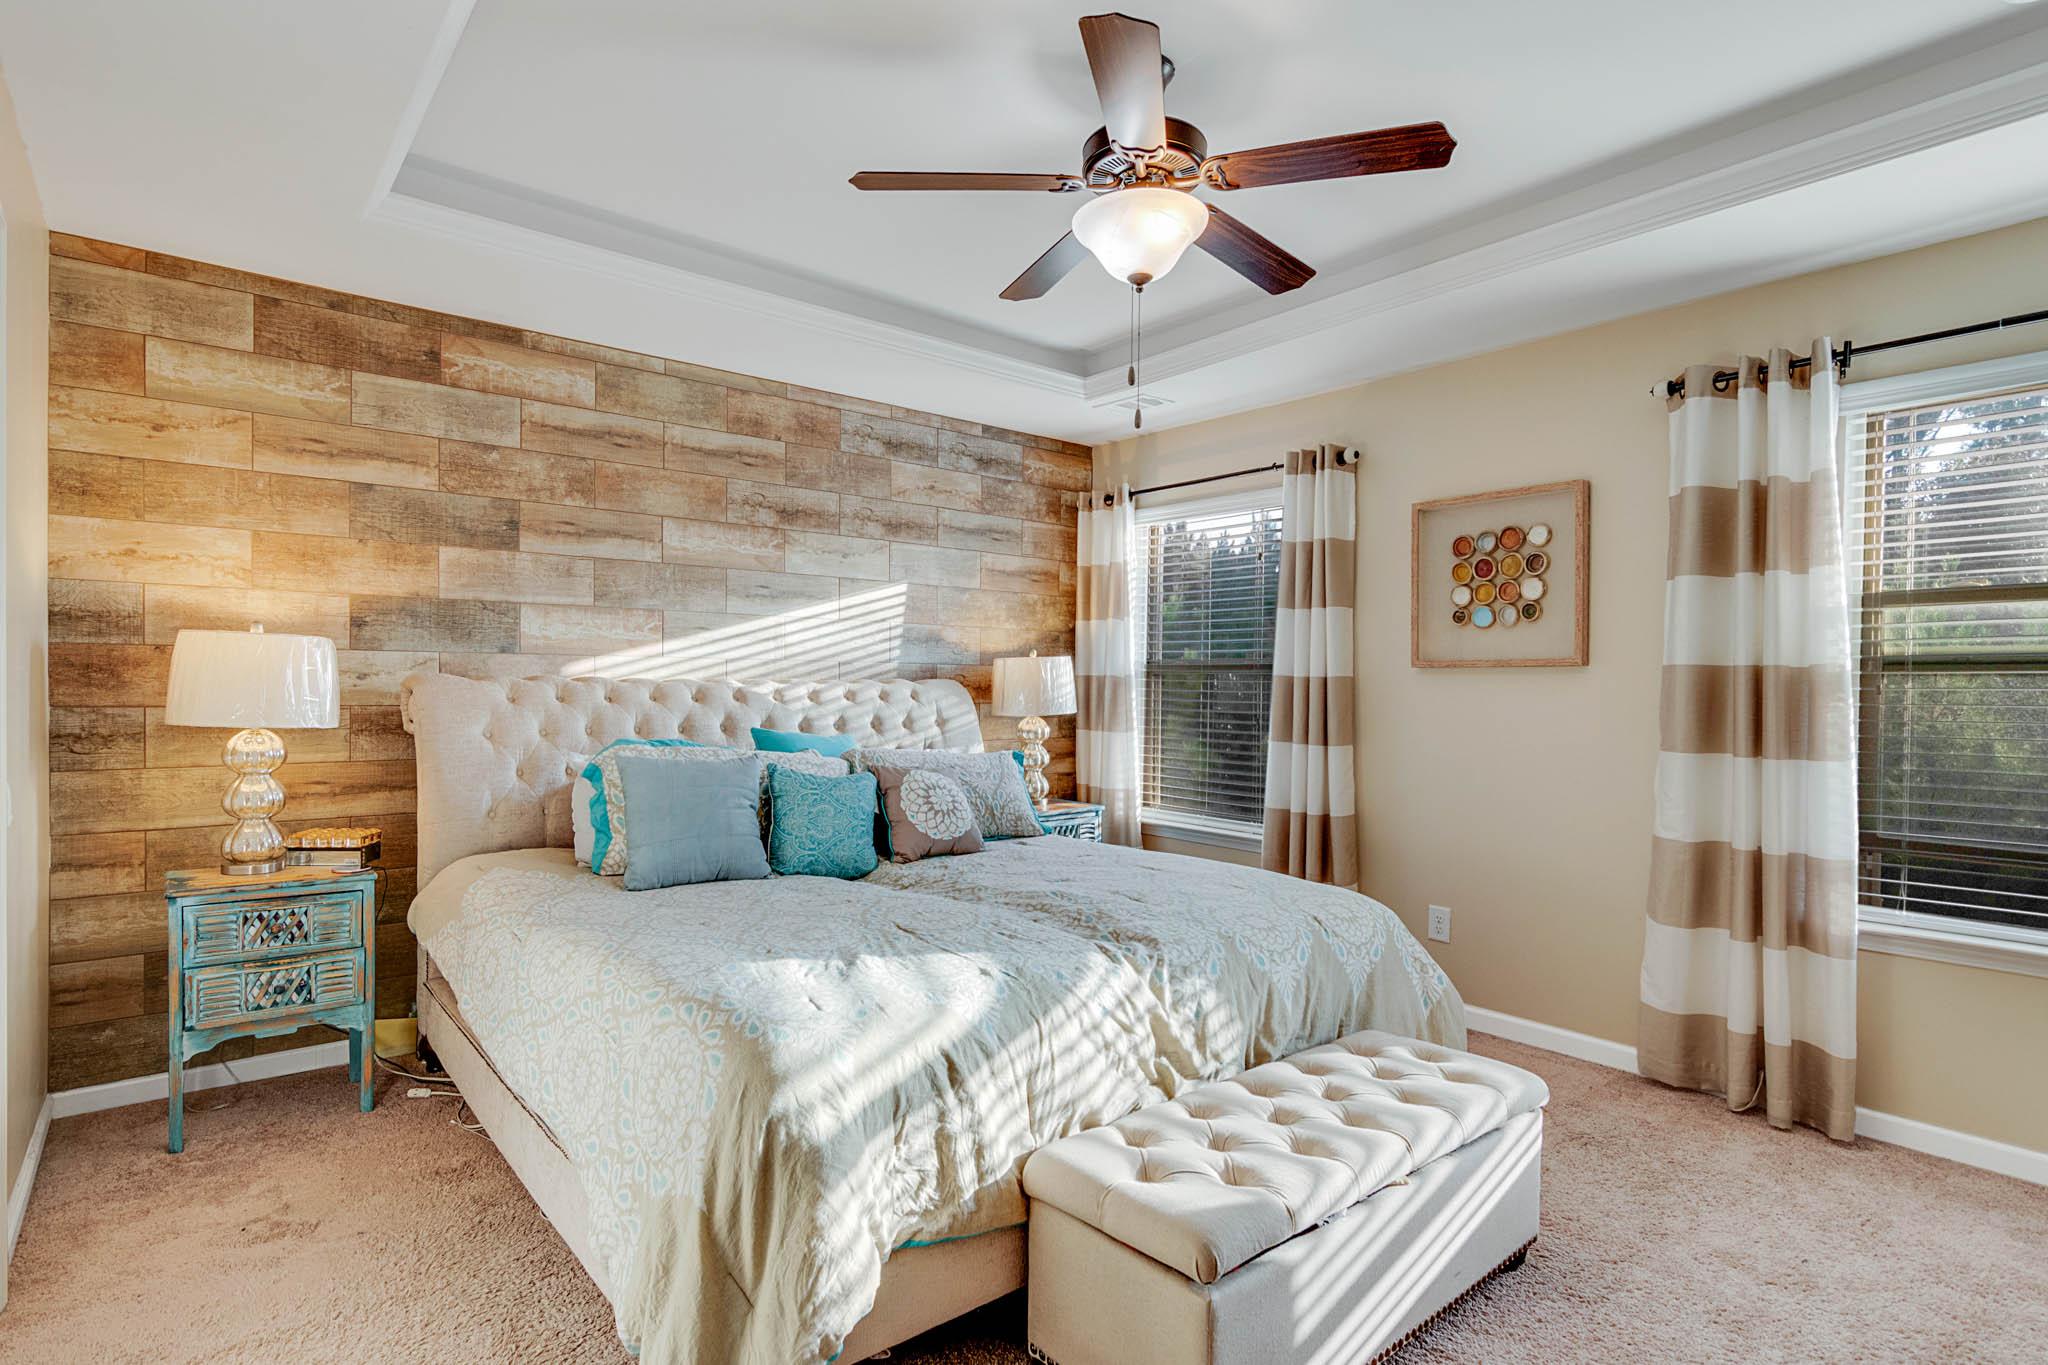 real_estate_photographer_bedroom_photography-1.jpg